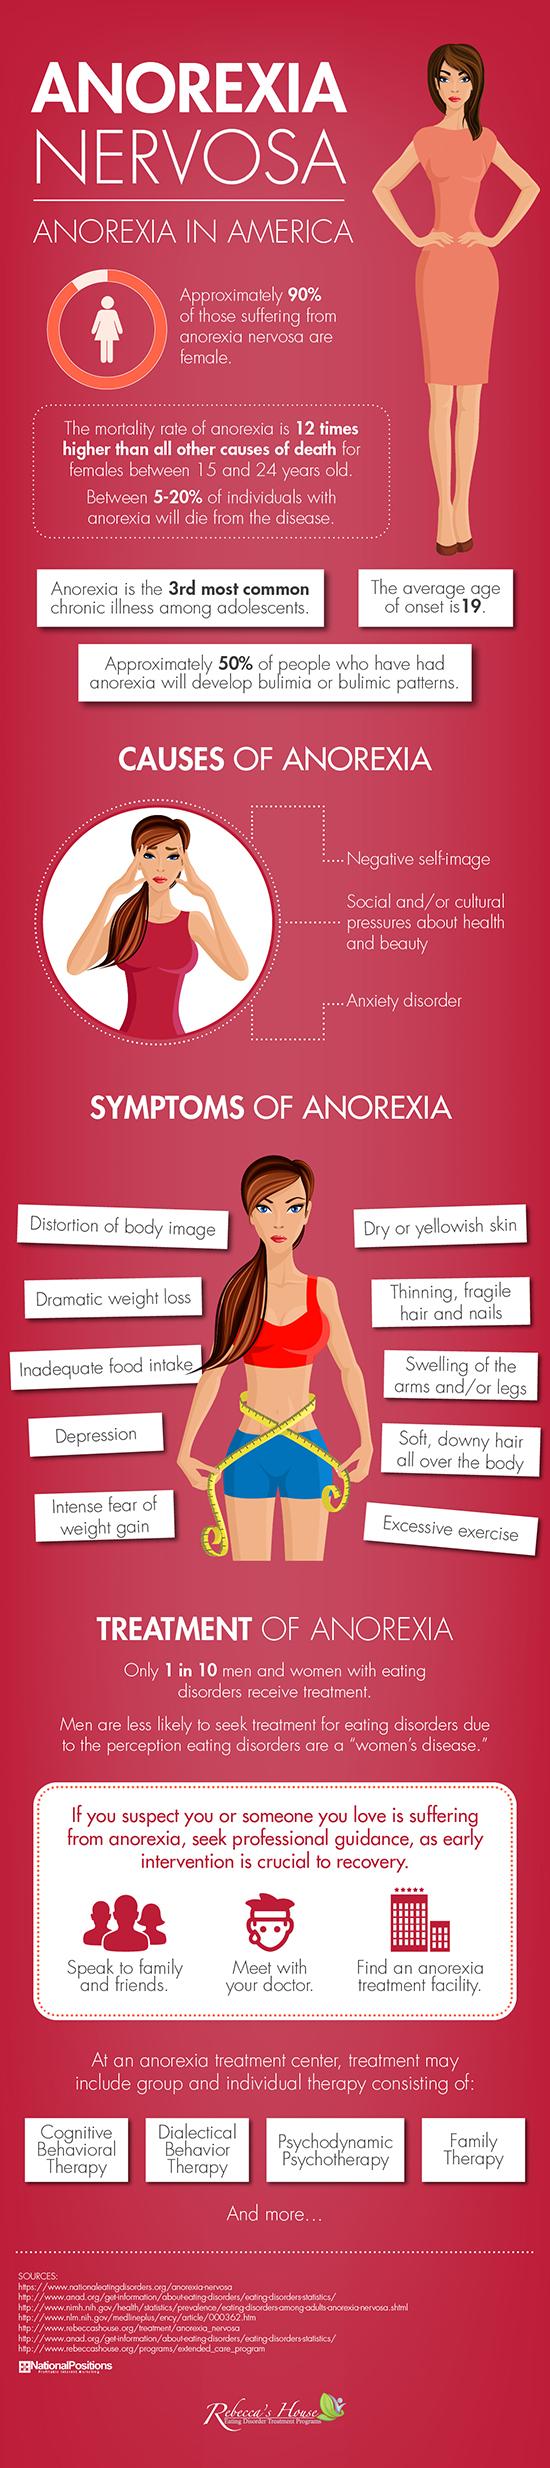 Rebecca's House Anorexia Info Graphic